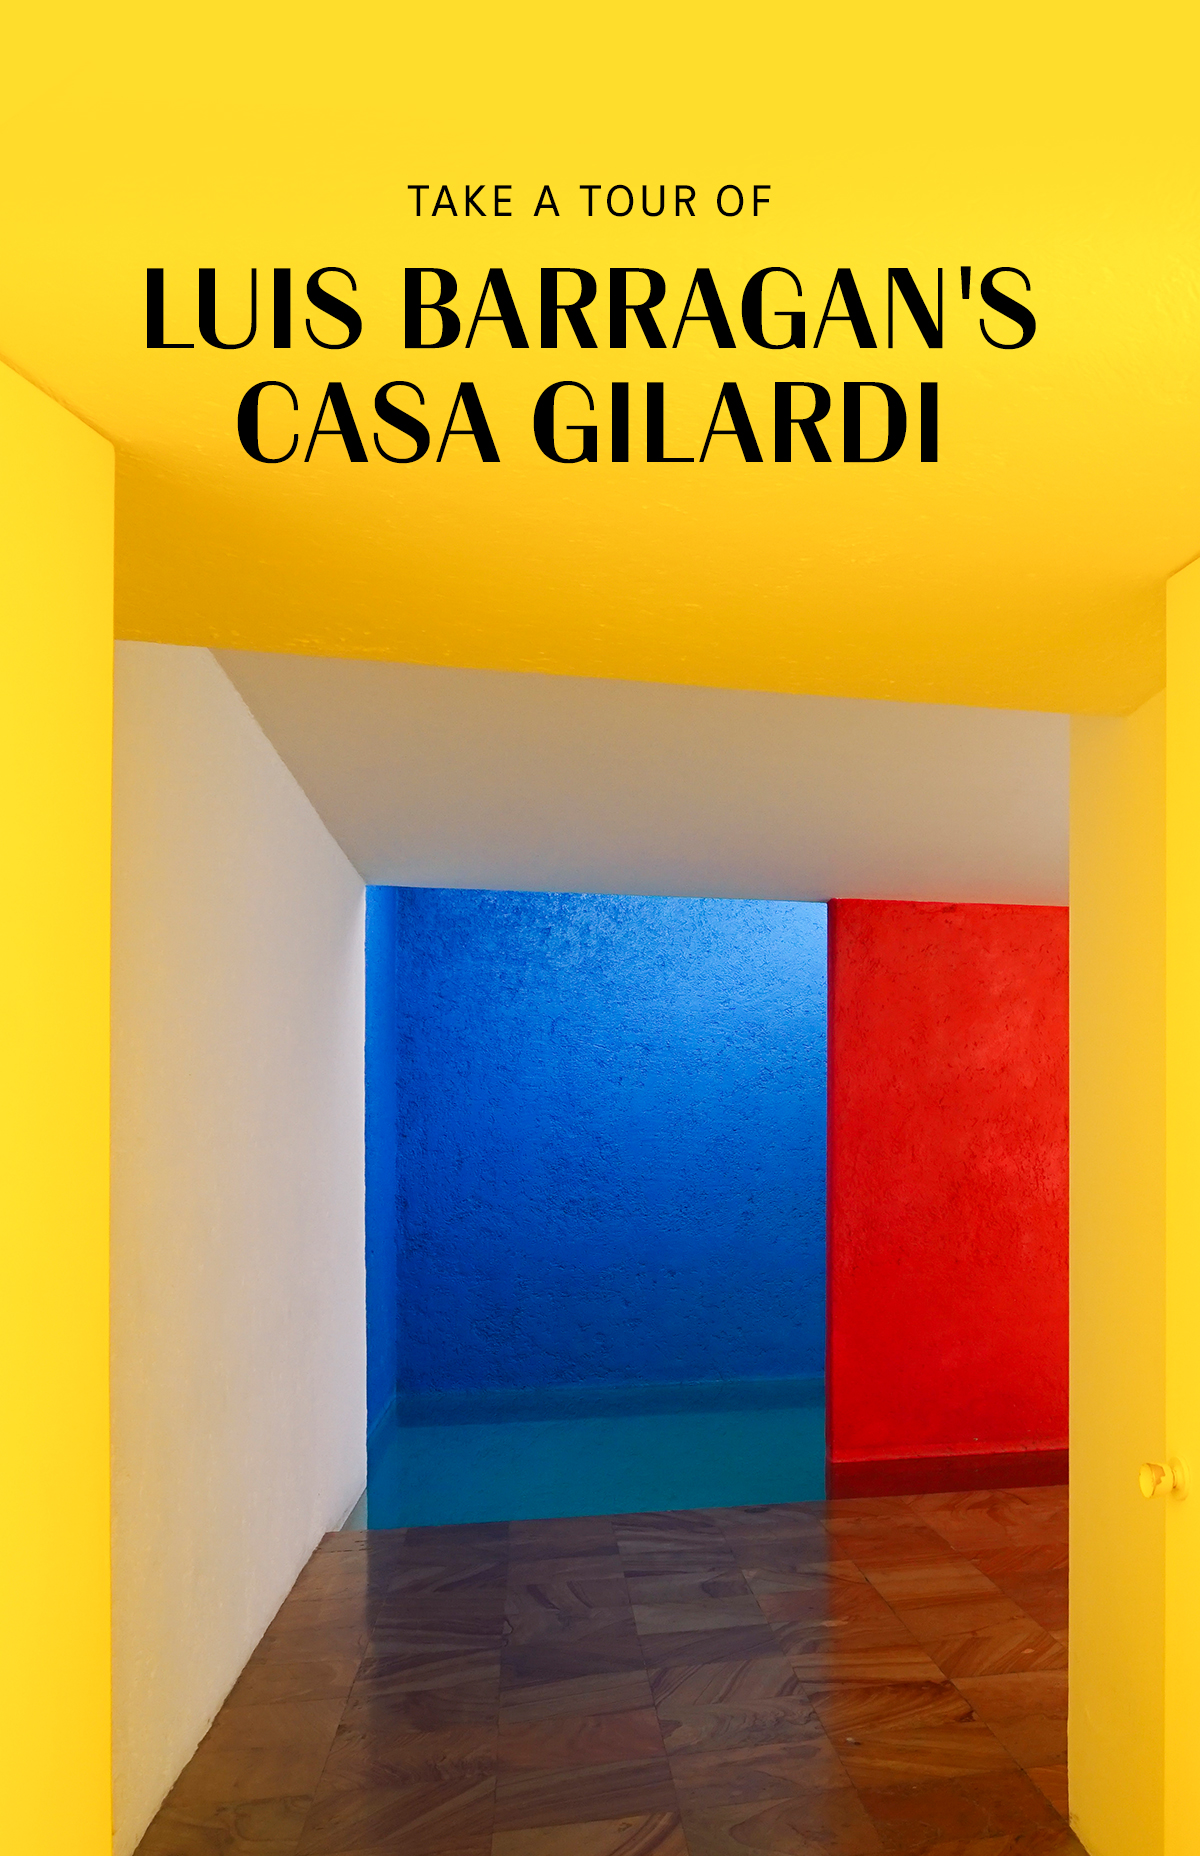 social-chrissihernandez-mexicocity-casagilardi-02.jpg